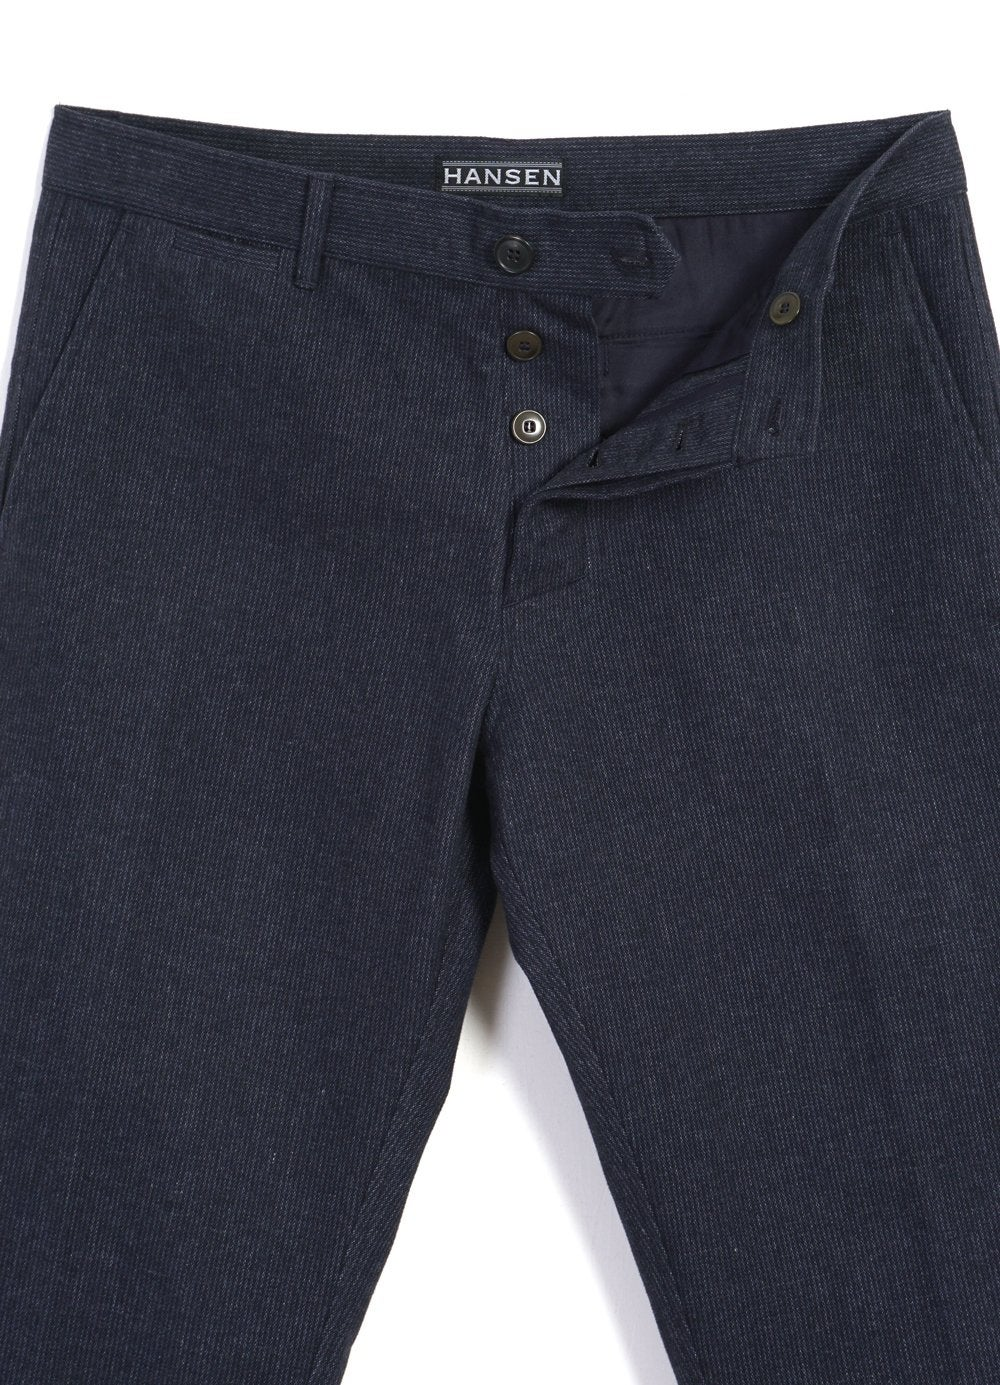 Hansen Garments FRED | Regular Fit Trousers | brushed blue